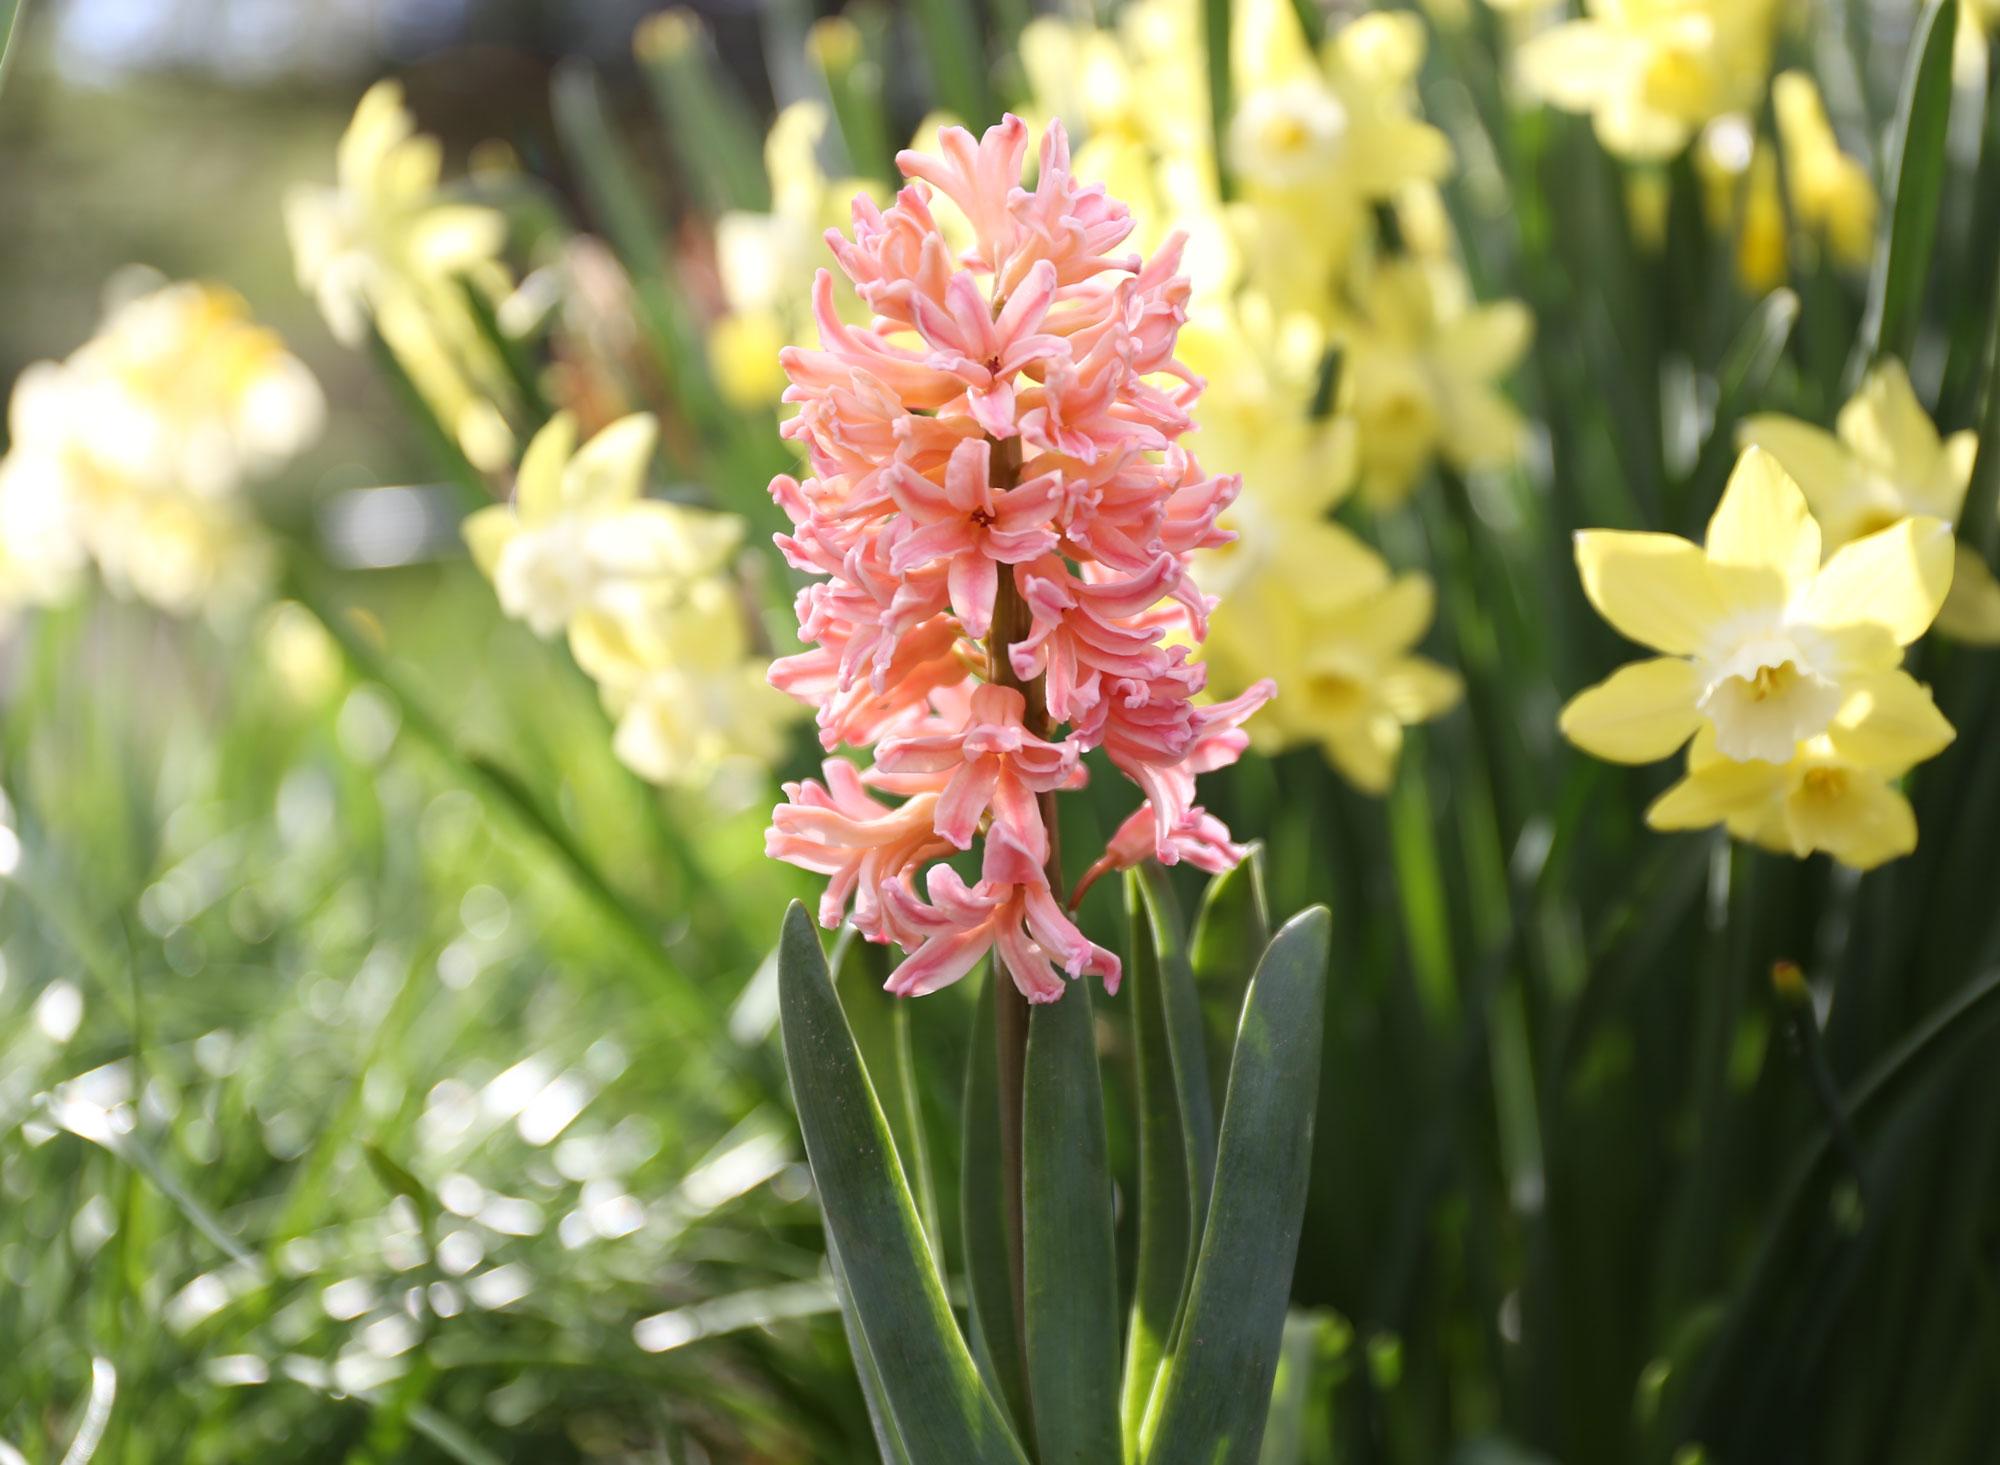 Coral Flowers Your Garden Needs Now - Longfield Gardens